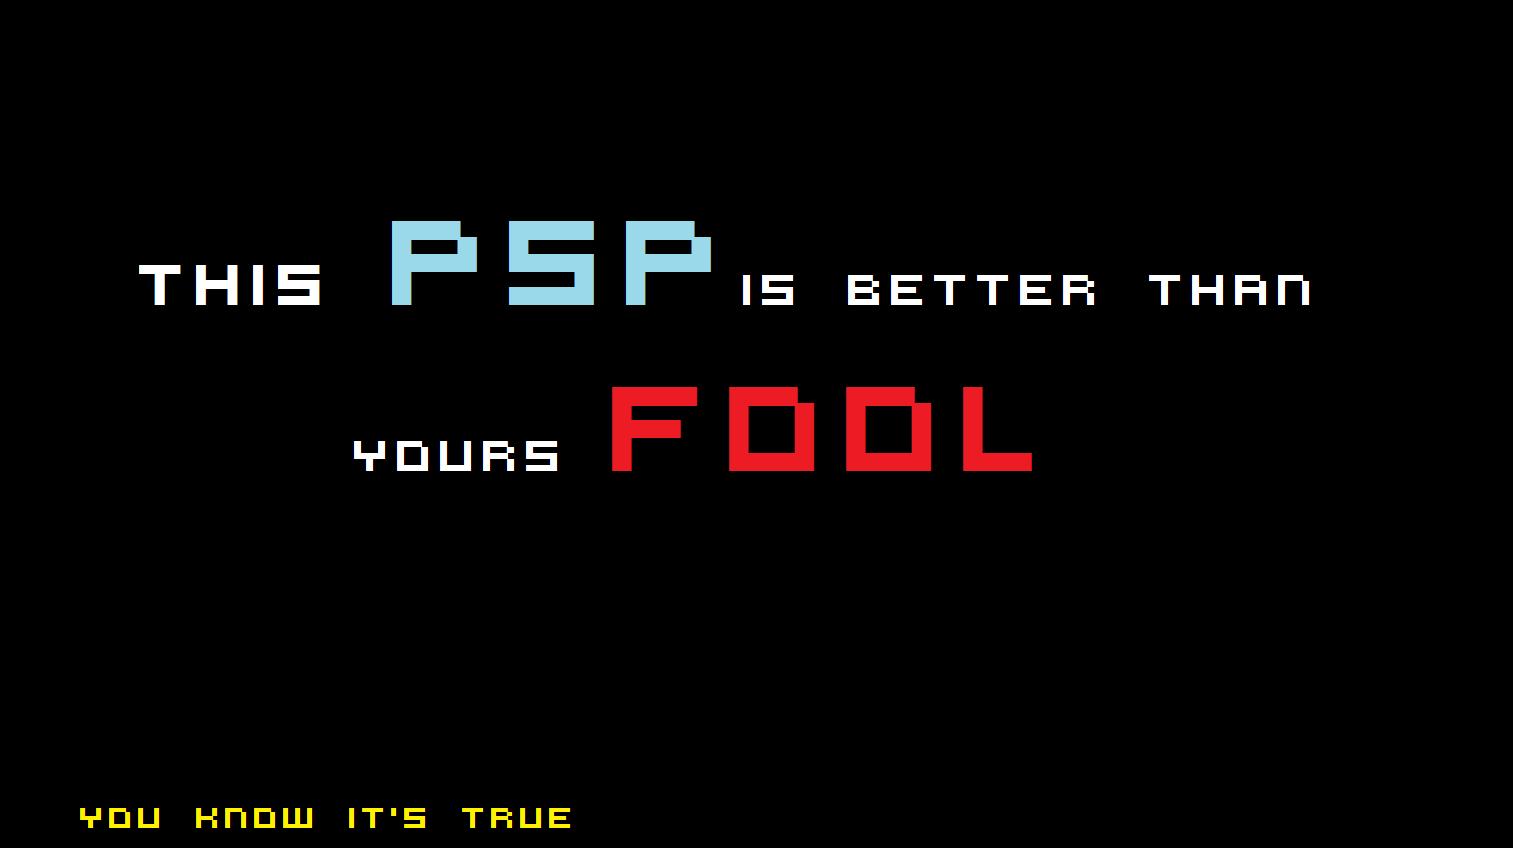 My psp is better pspgo poster